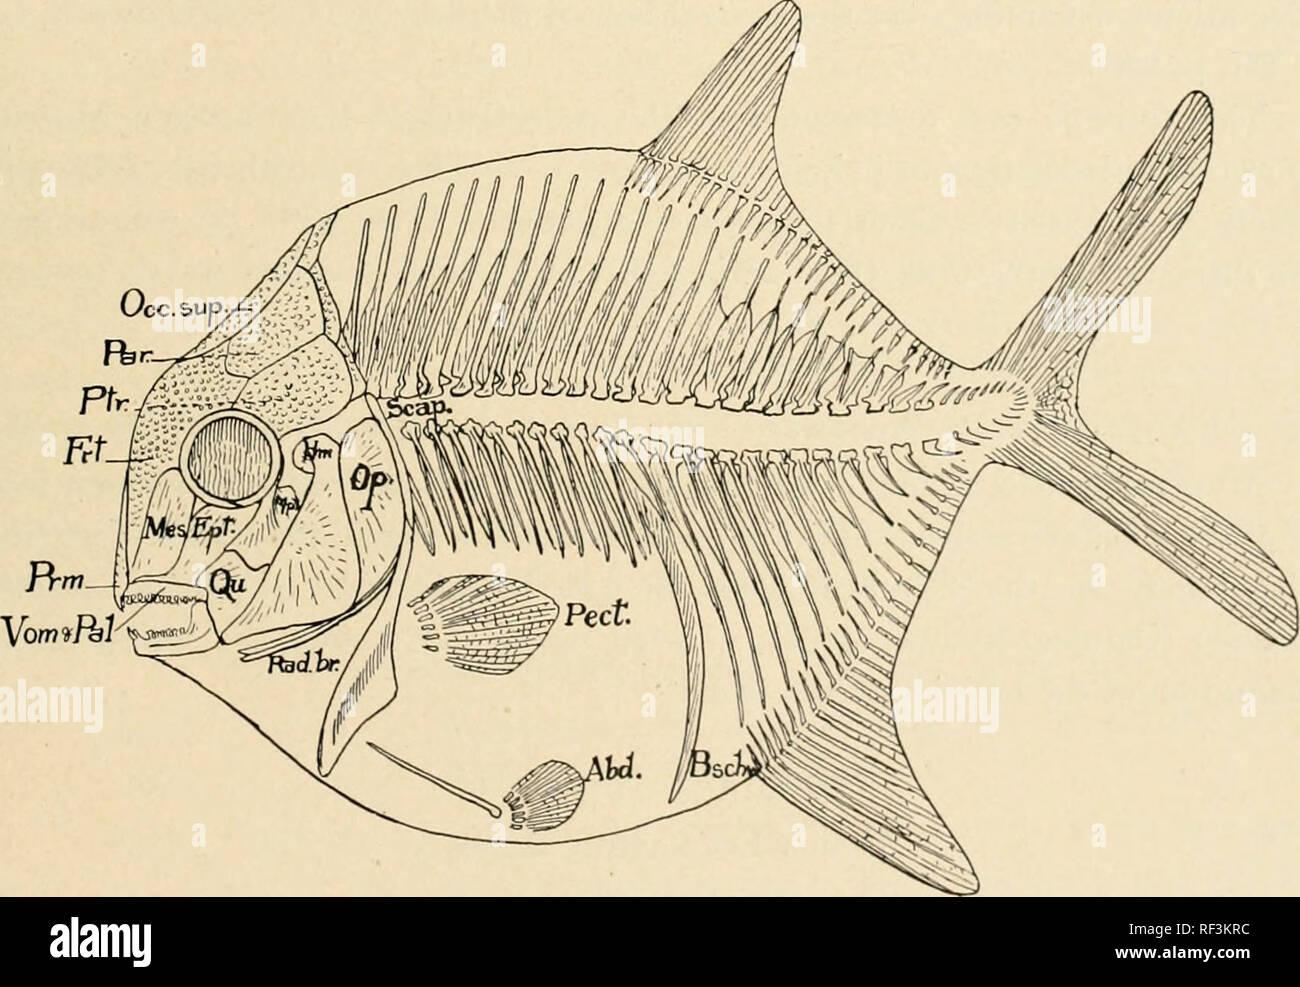 Beaucoup de poissons datant service Raleigh Caroline du Nord